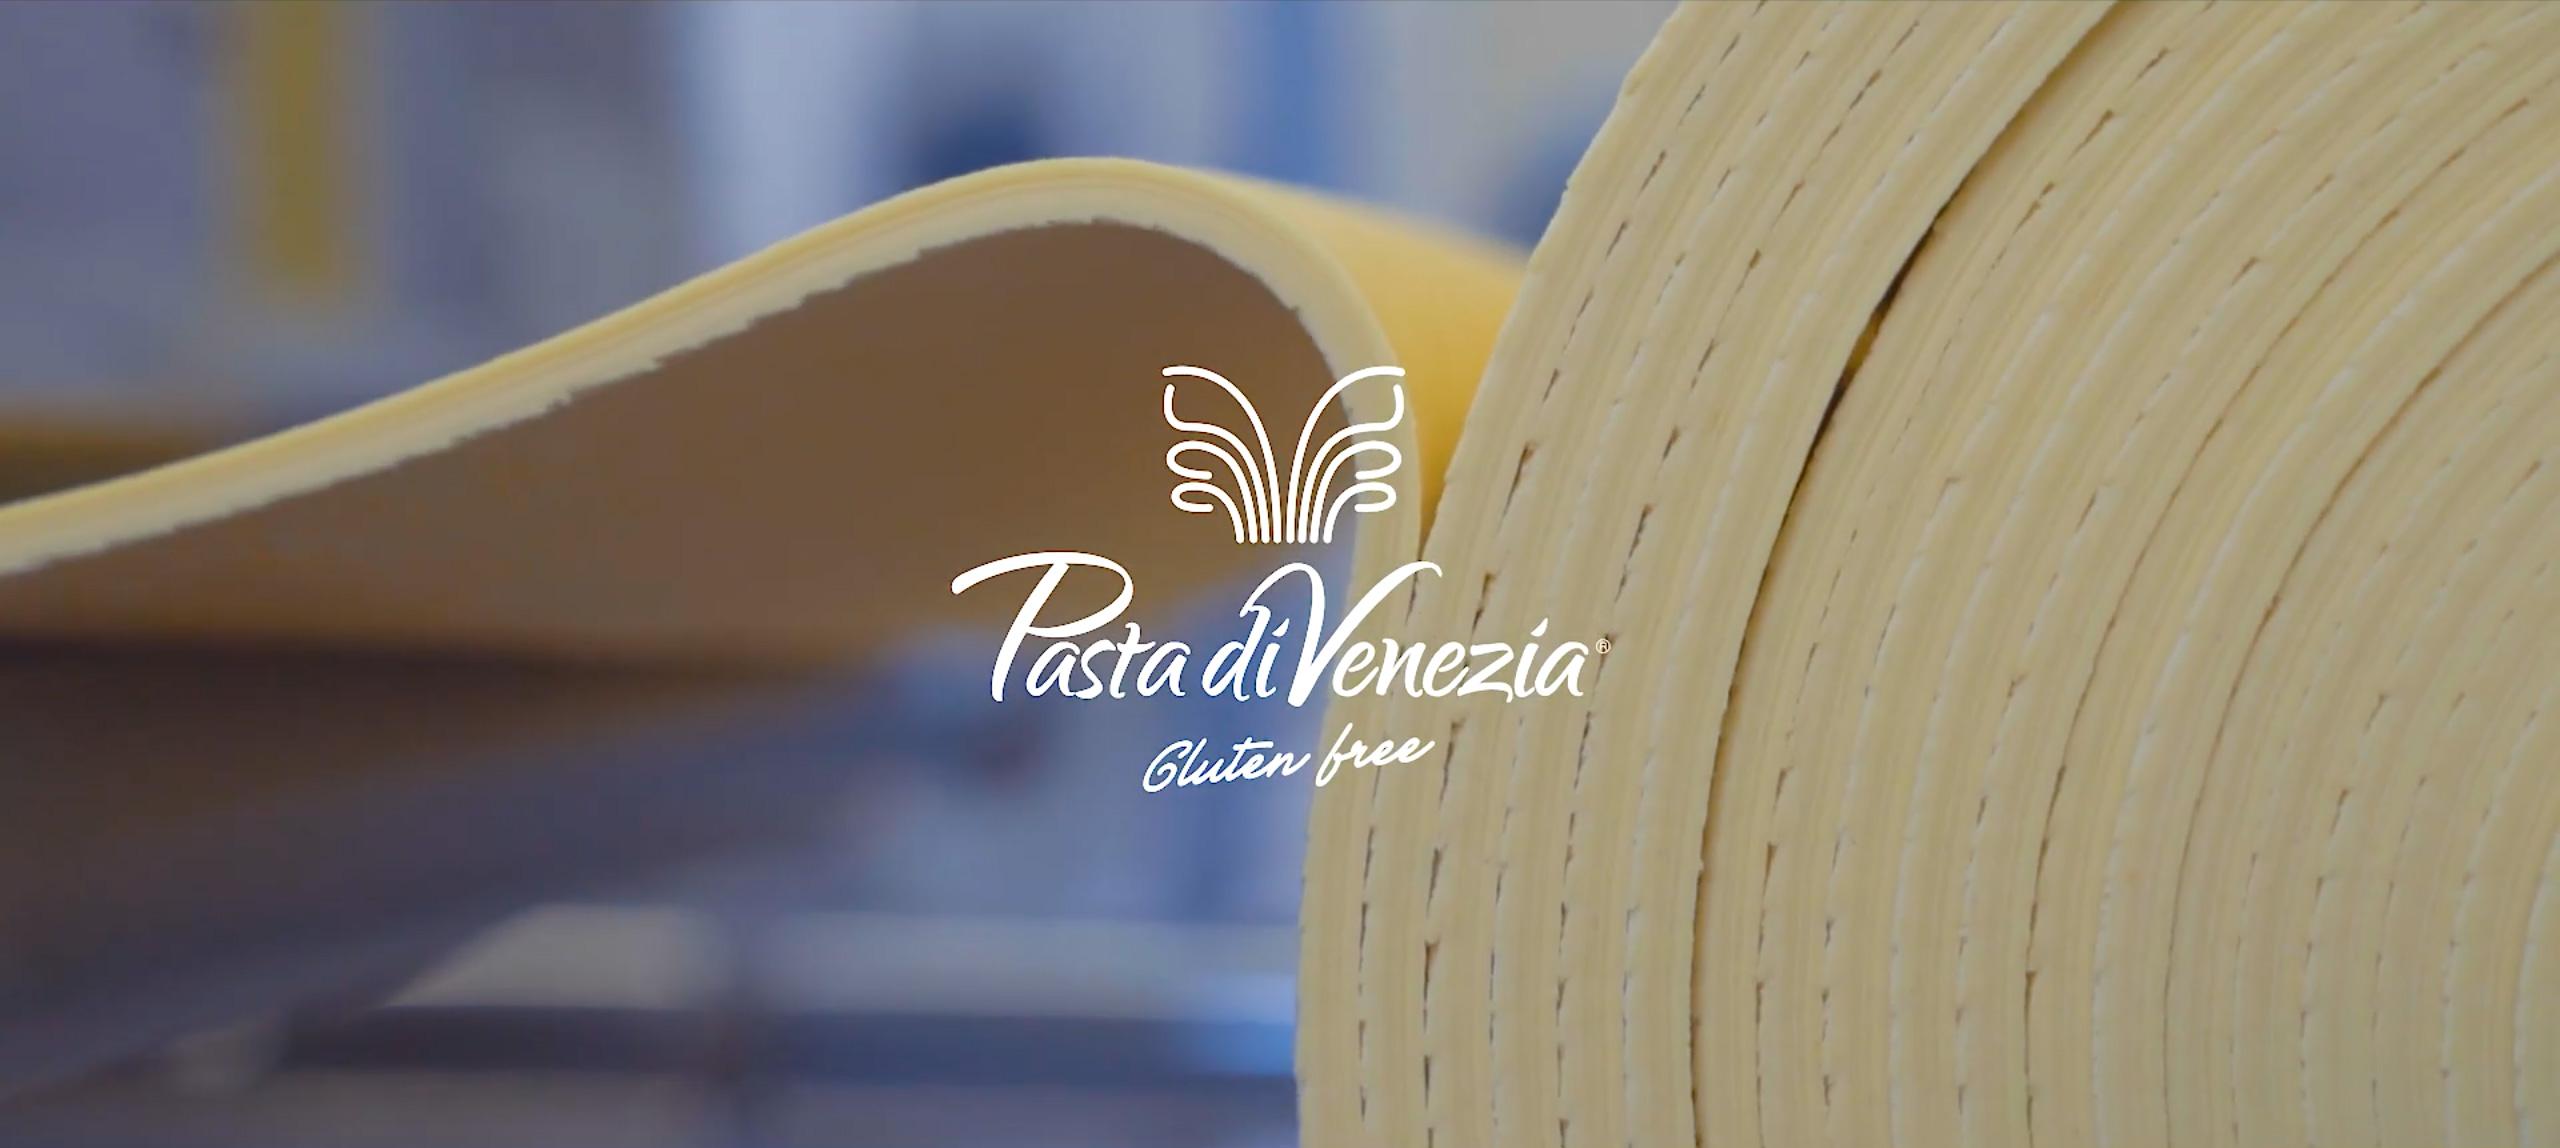 Anteprima Video Pasta di Venezia - Pasta Biologica e Gluten Free